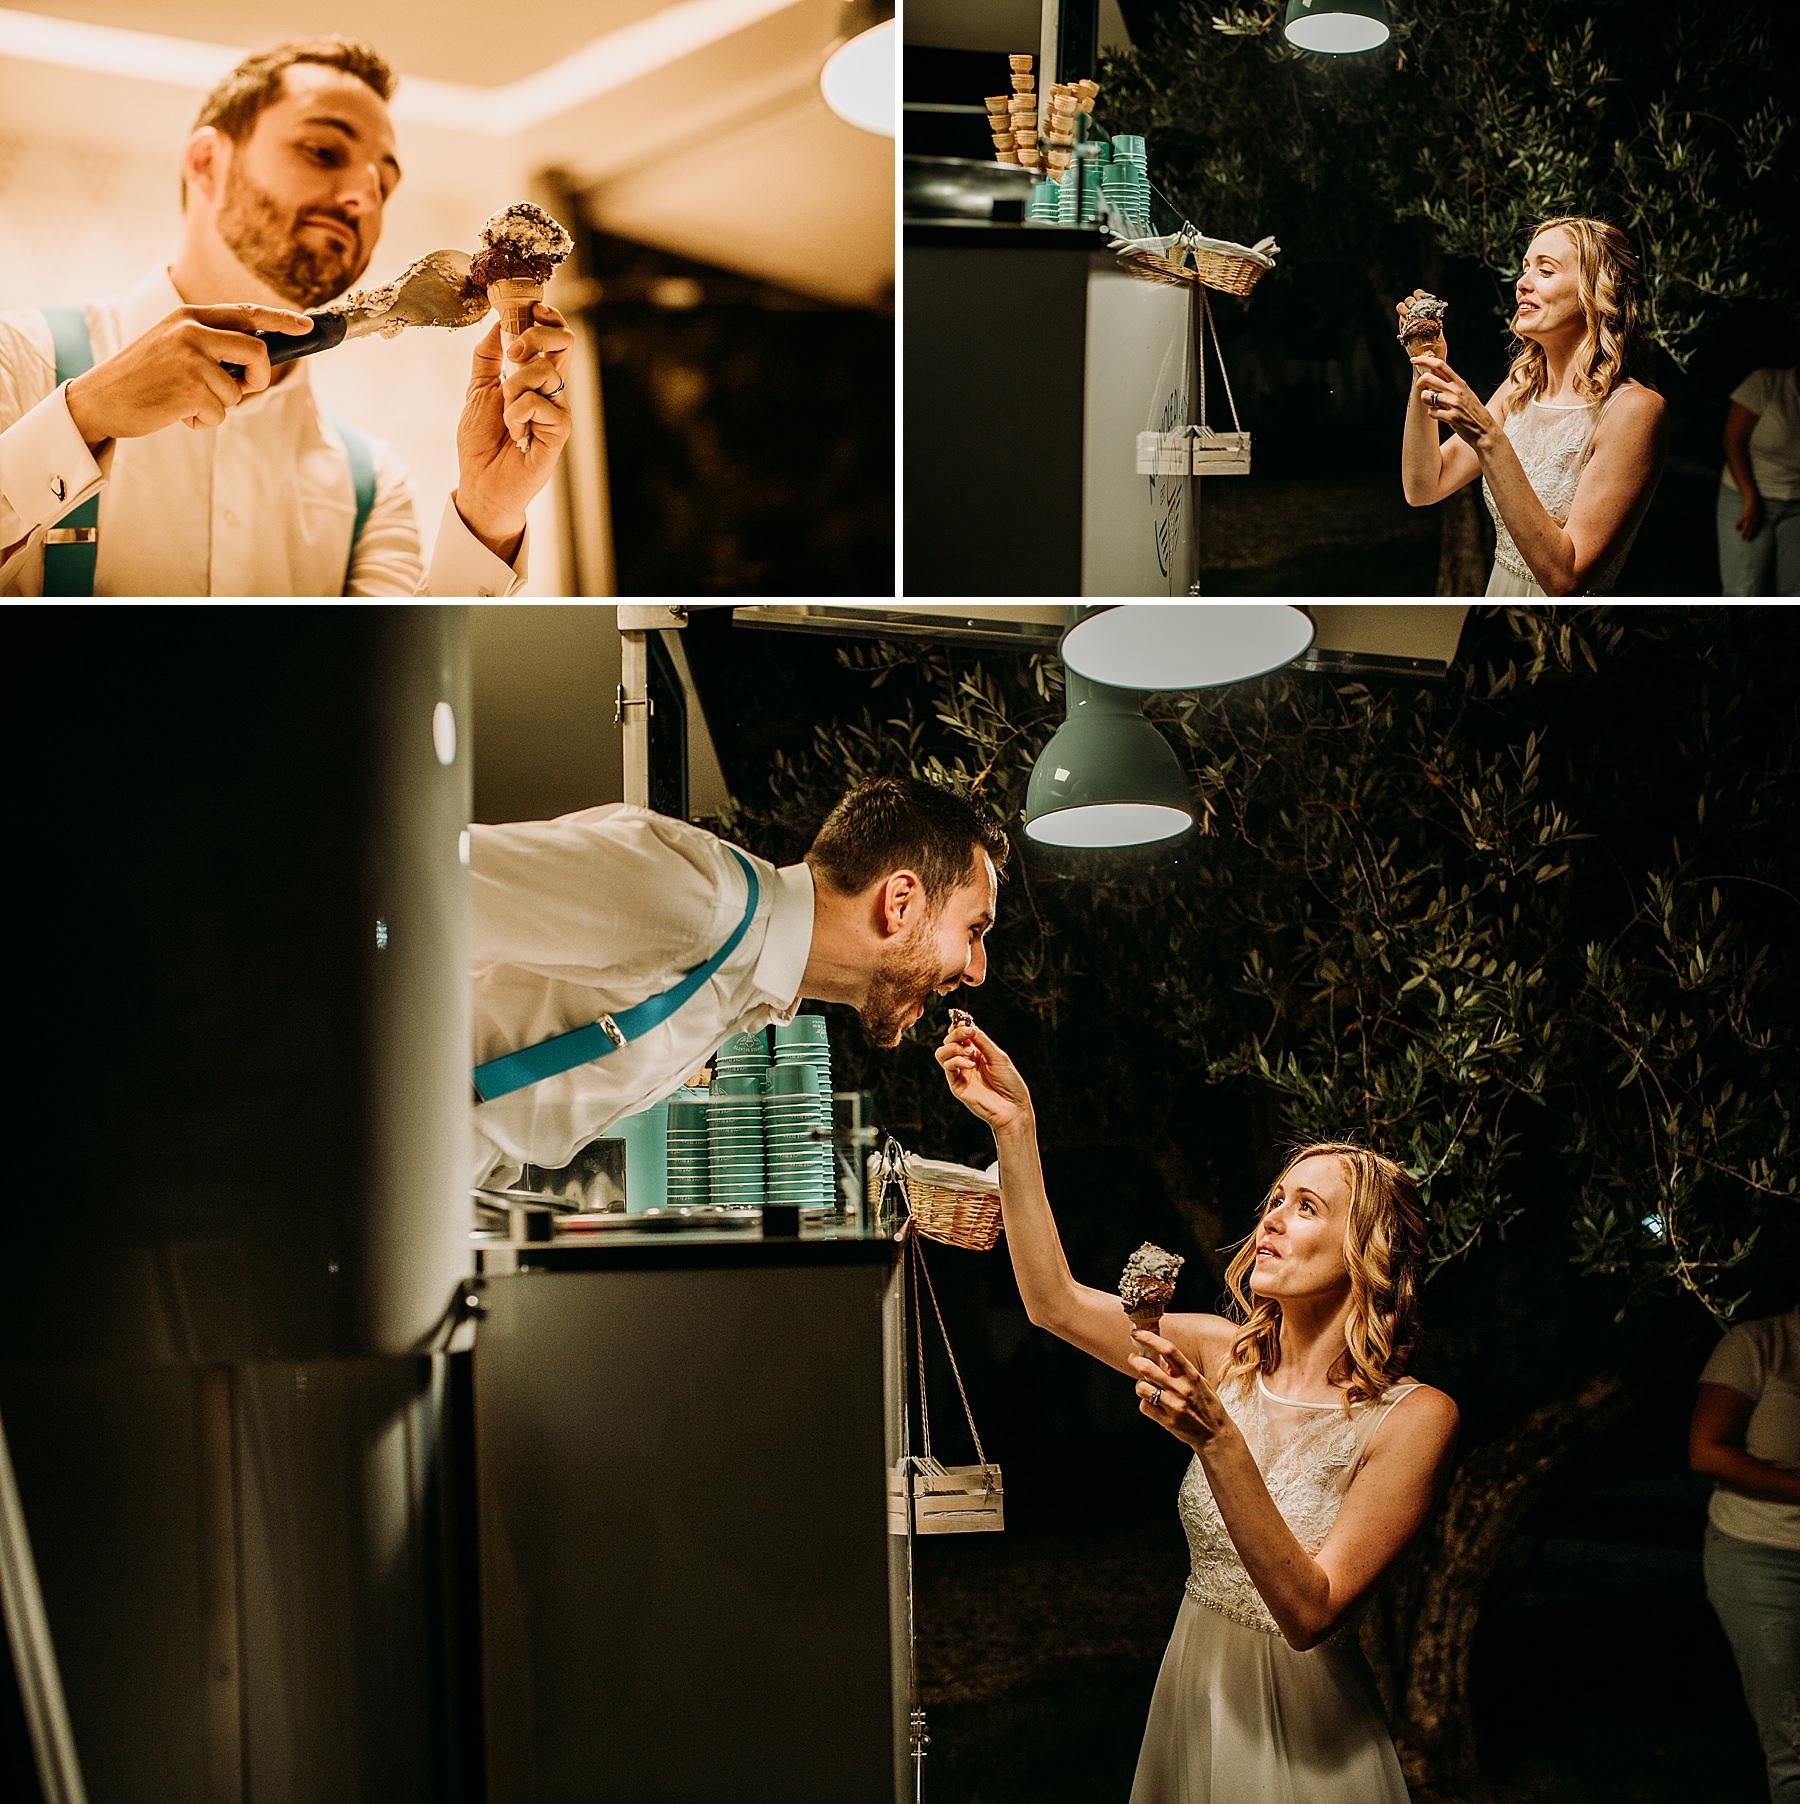 Matrimonio nel Chianti Impruneta Firenze Agriturismo I Viticci party gelato